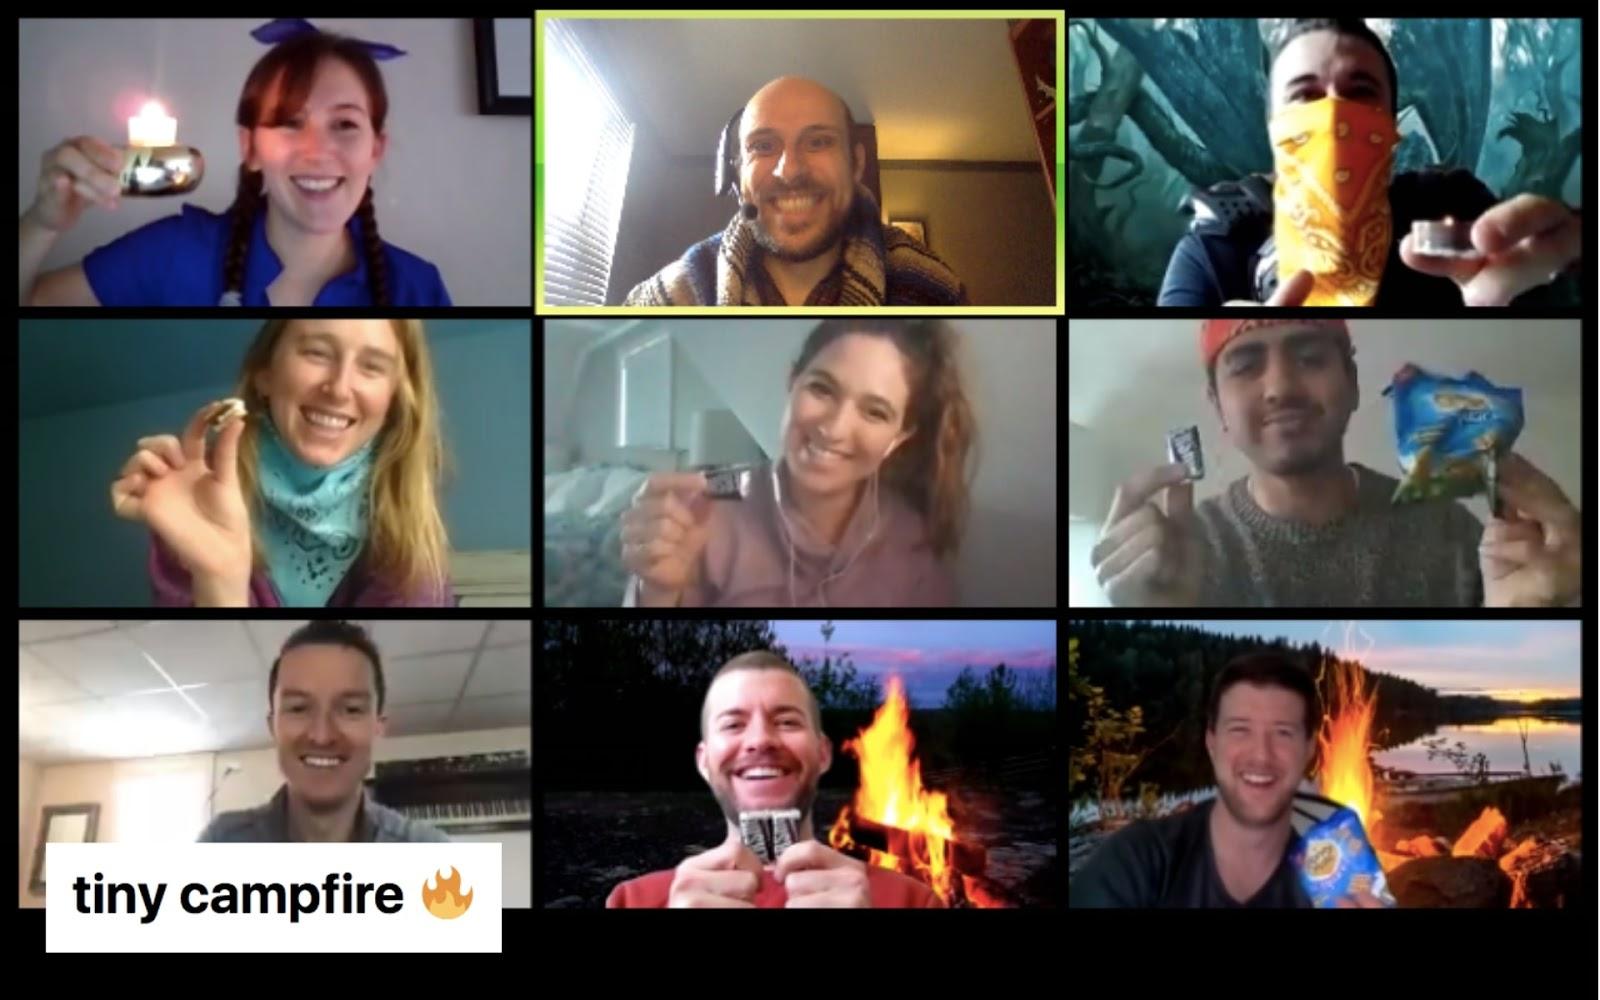 A screenshot of participants in a virtual campfire